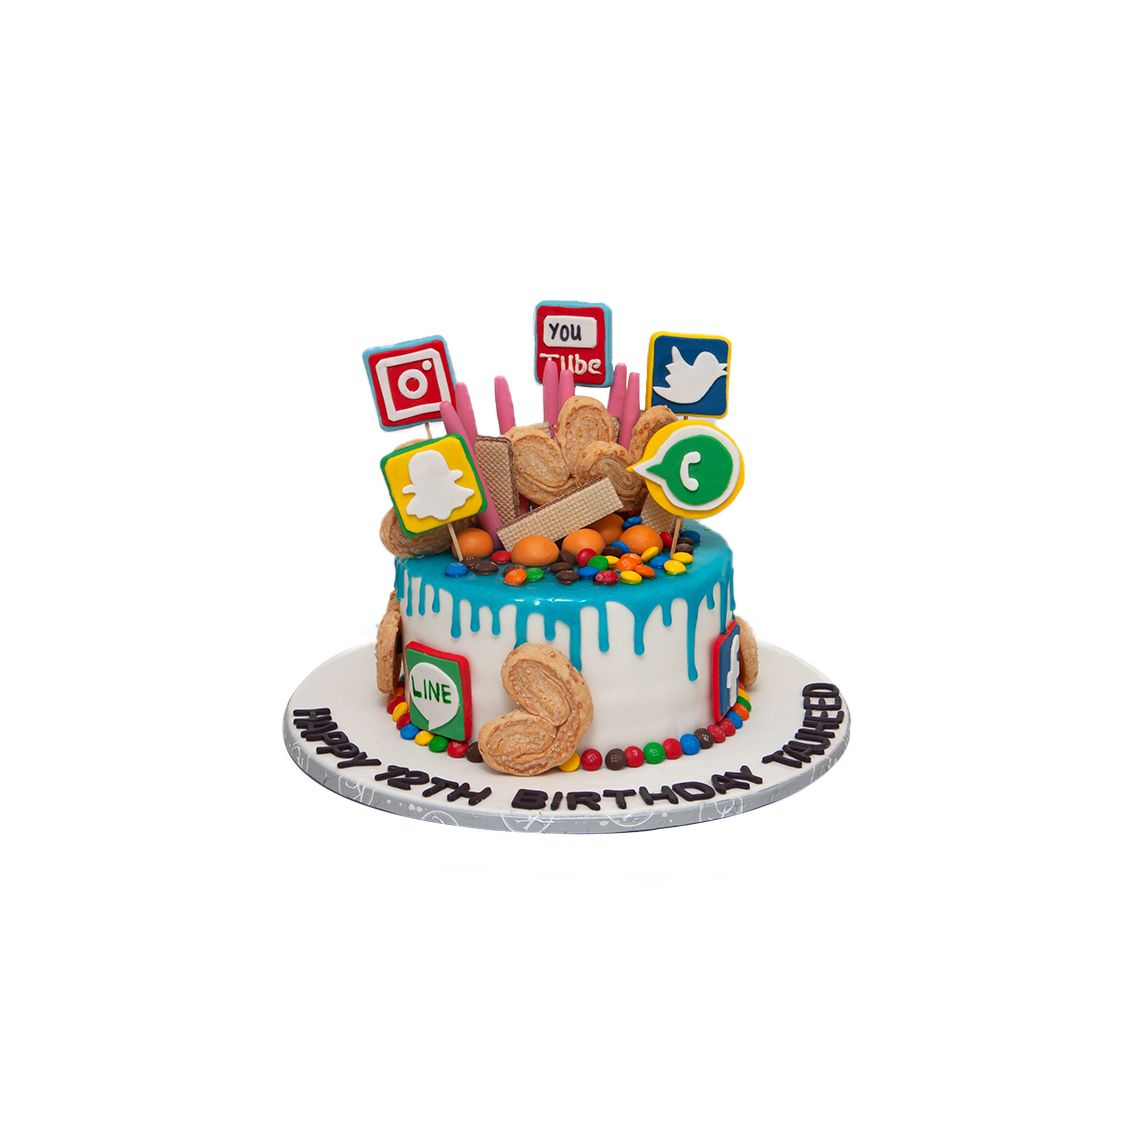 Kitchen Cuisine Default Category Social Media Cake